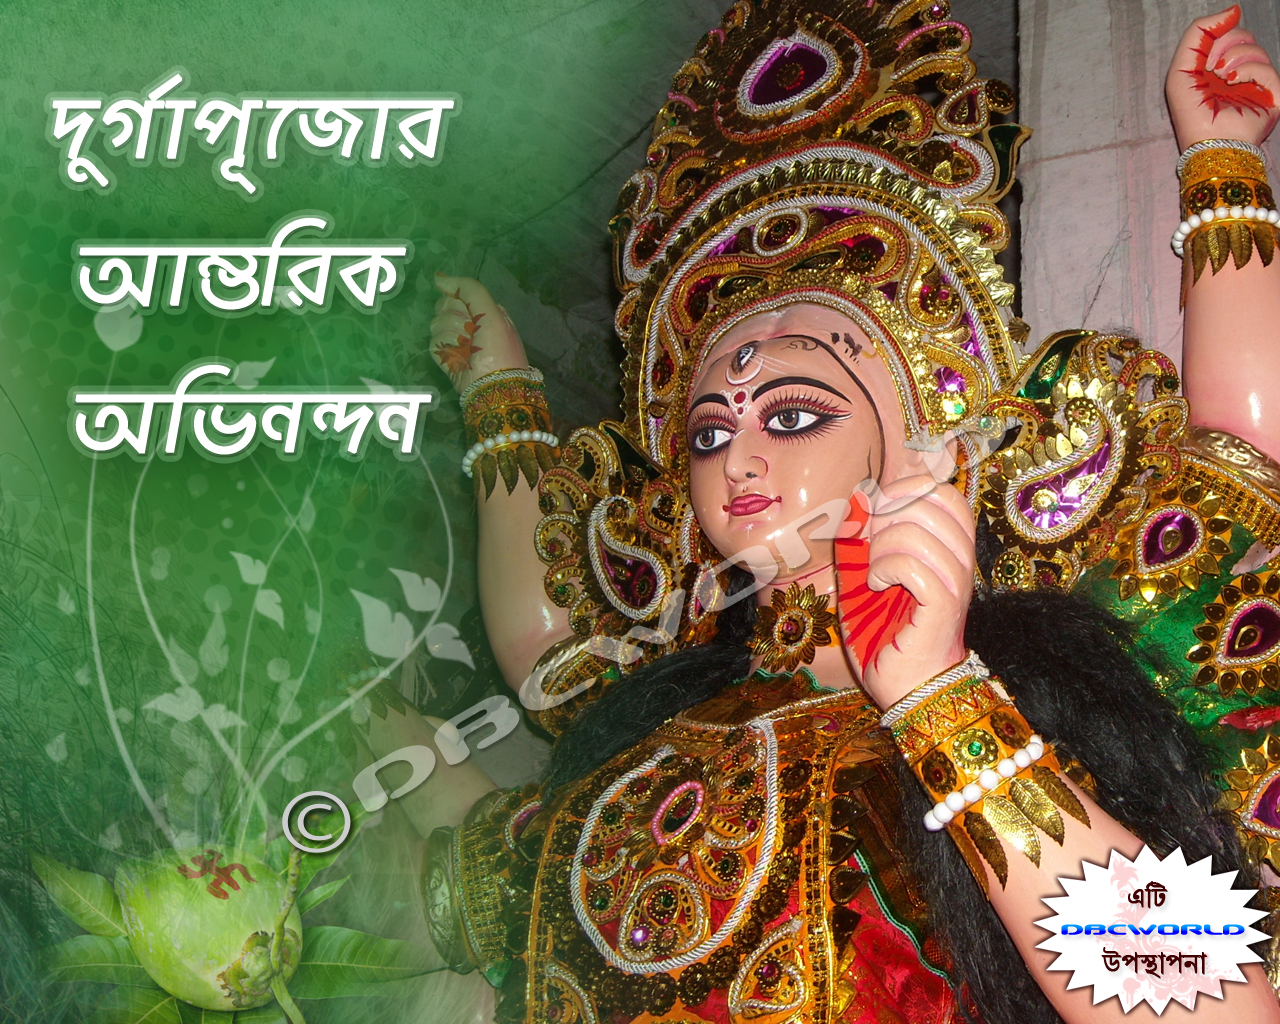 Durga Puja Wallpaperwallpaper Of Sharad Utsavdurga Puja Of Bengal